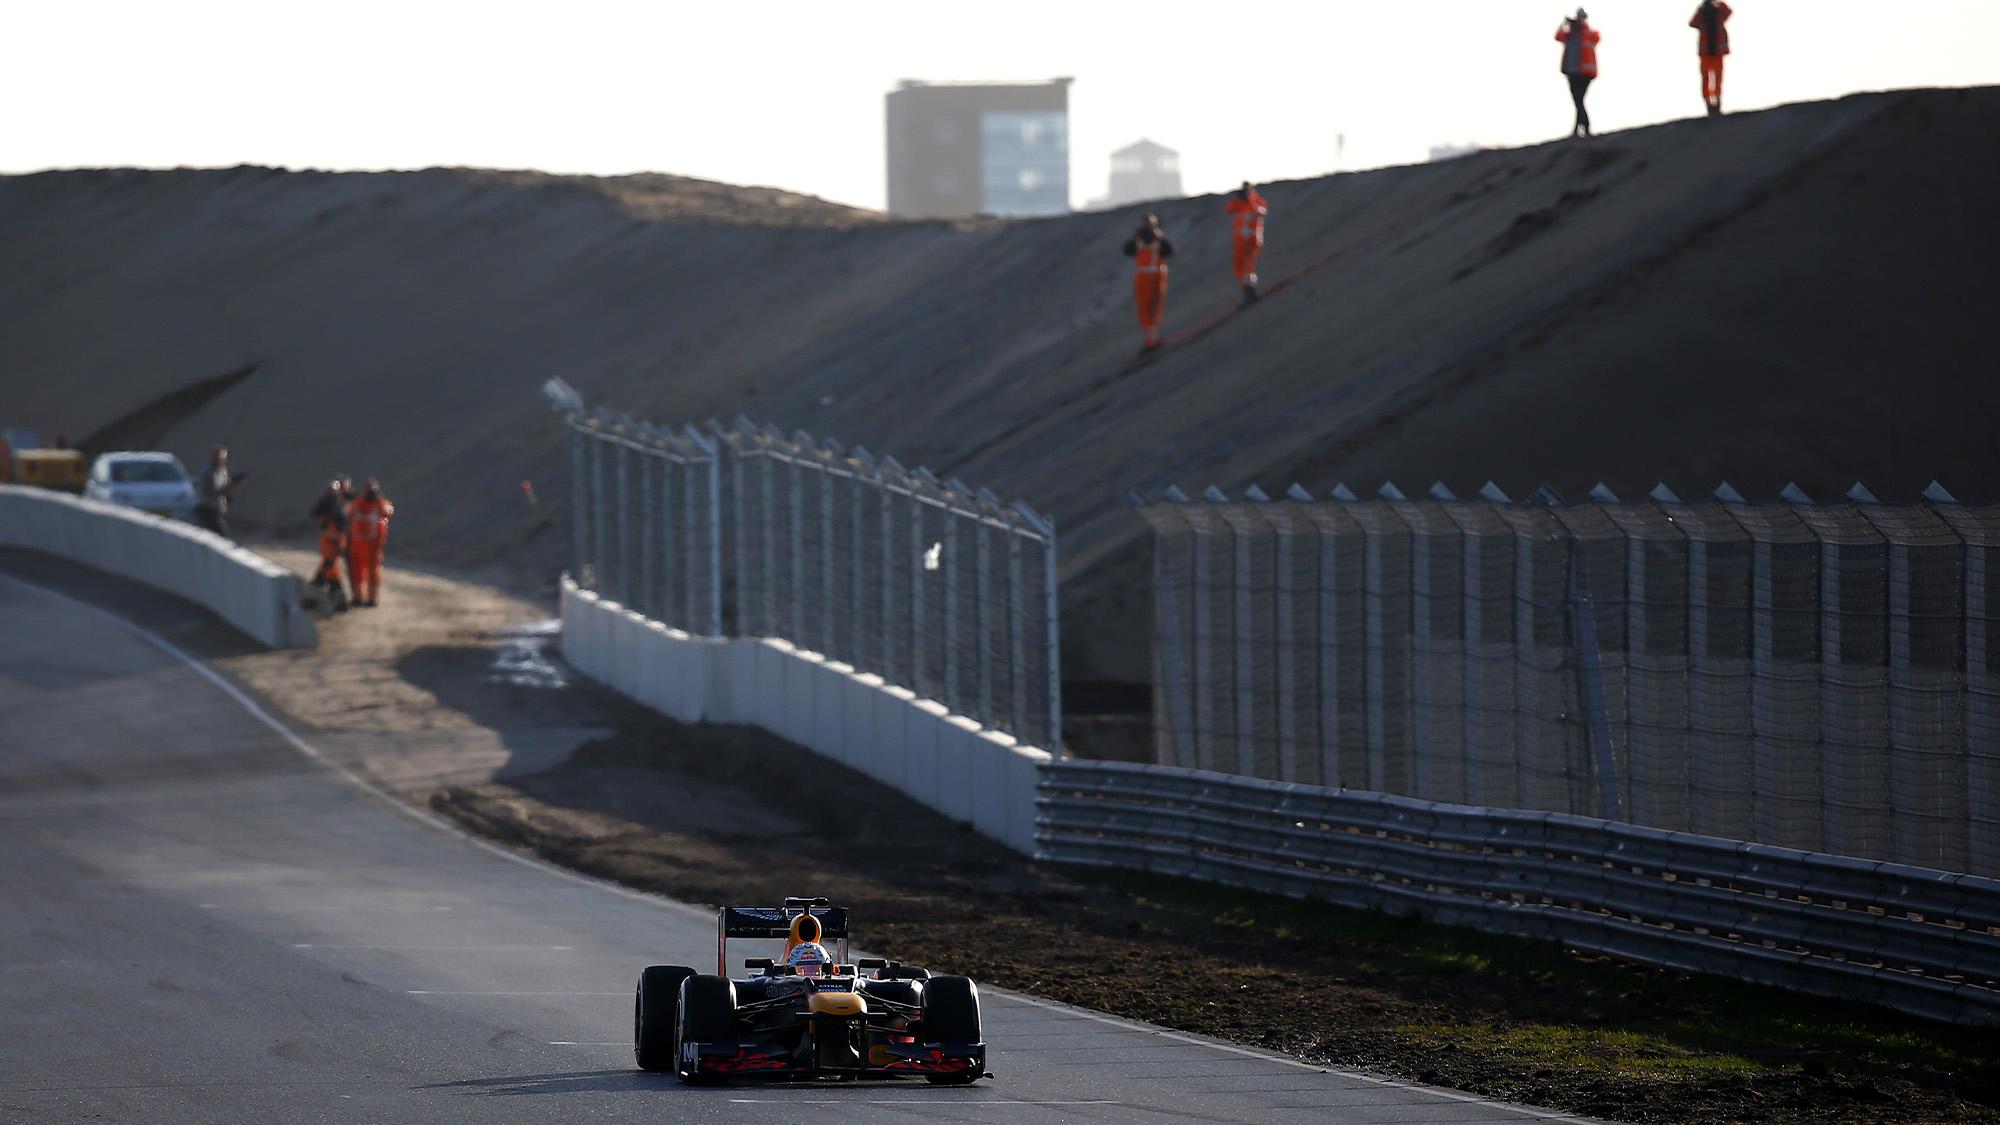 Max Verstappen drives his Red Bull at Zandvoort in 2020